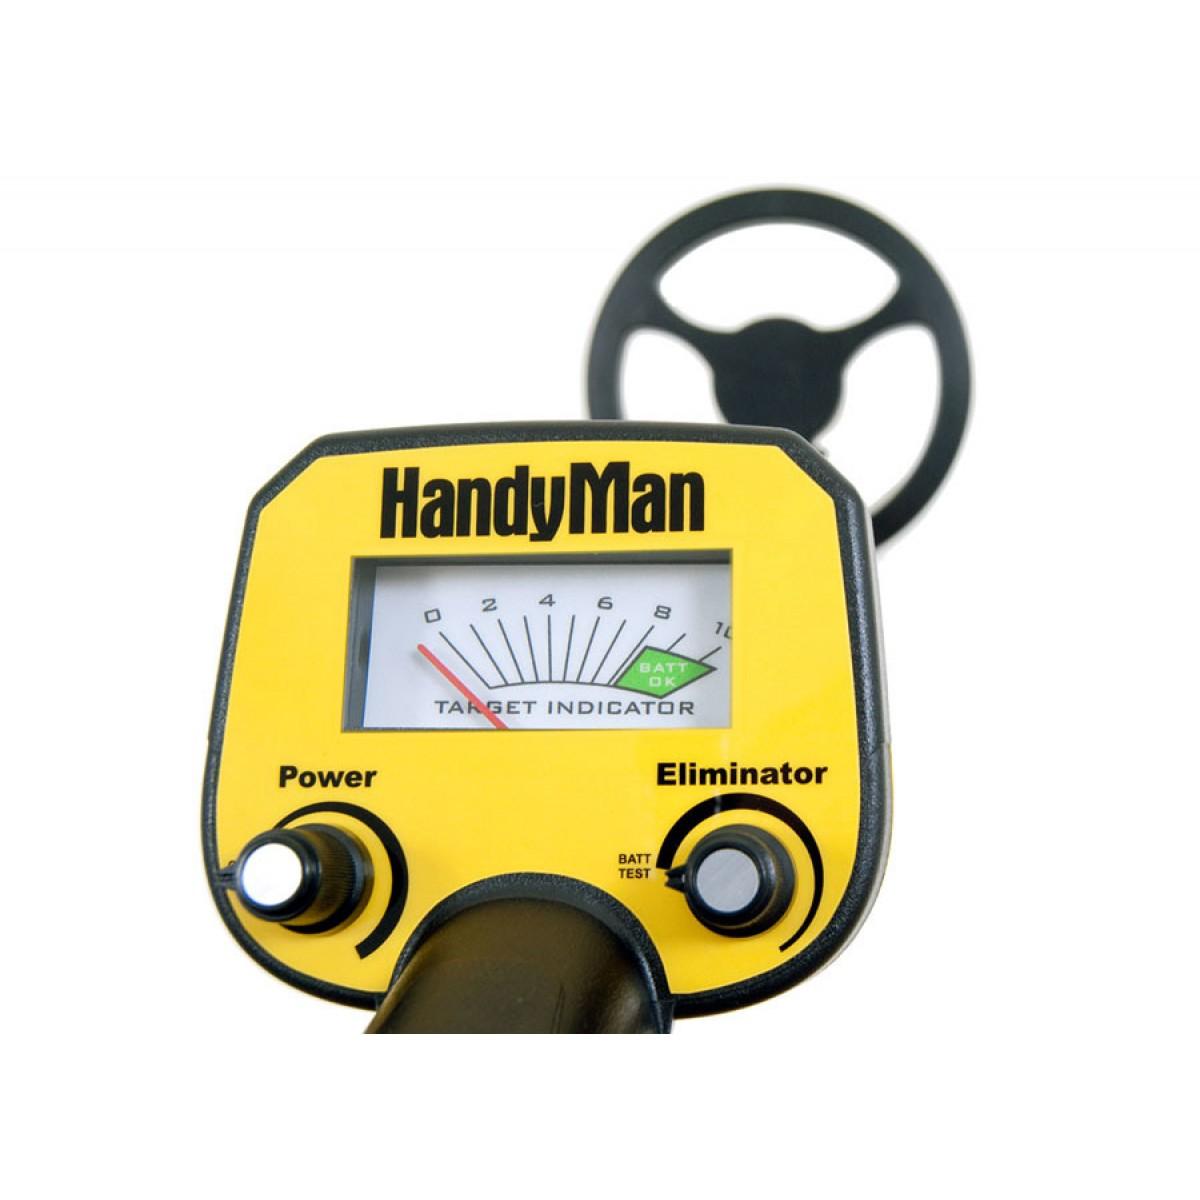 Bounty Hunter HandyMan металлоискатель металлодетектор грунтовый металлодетектор